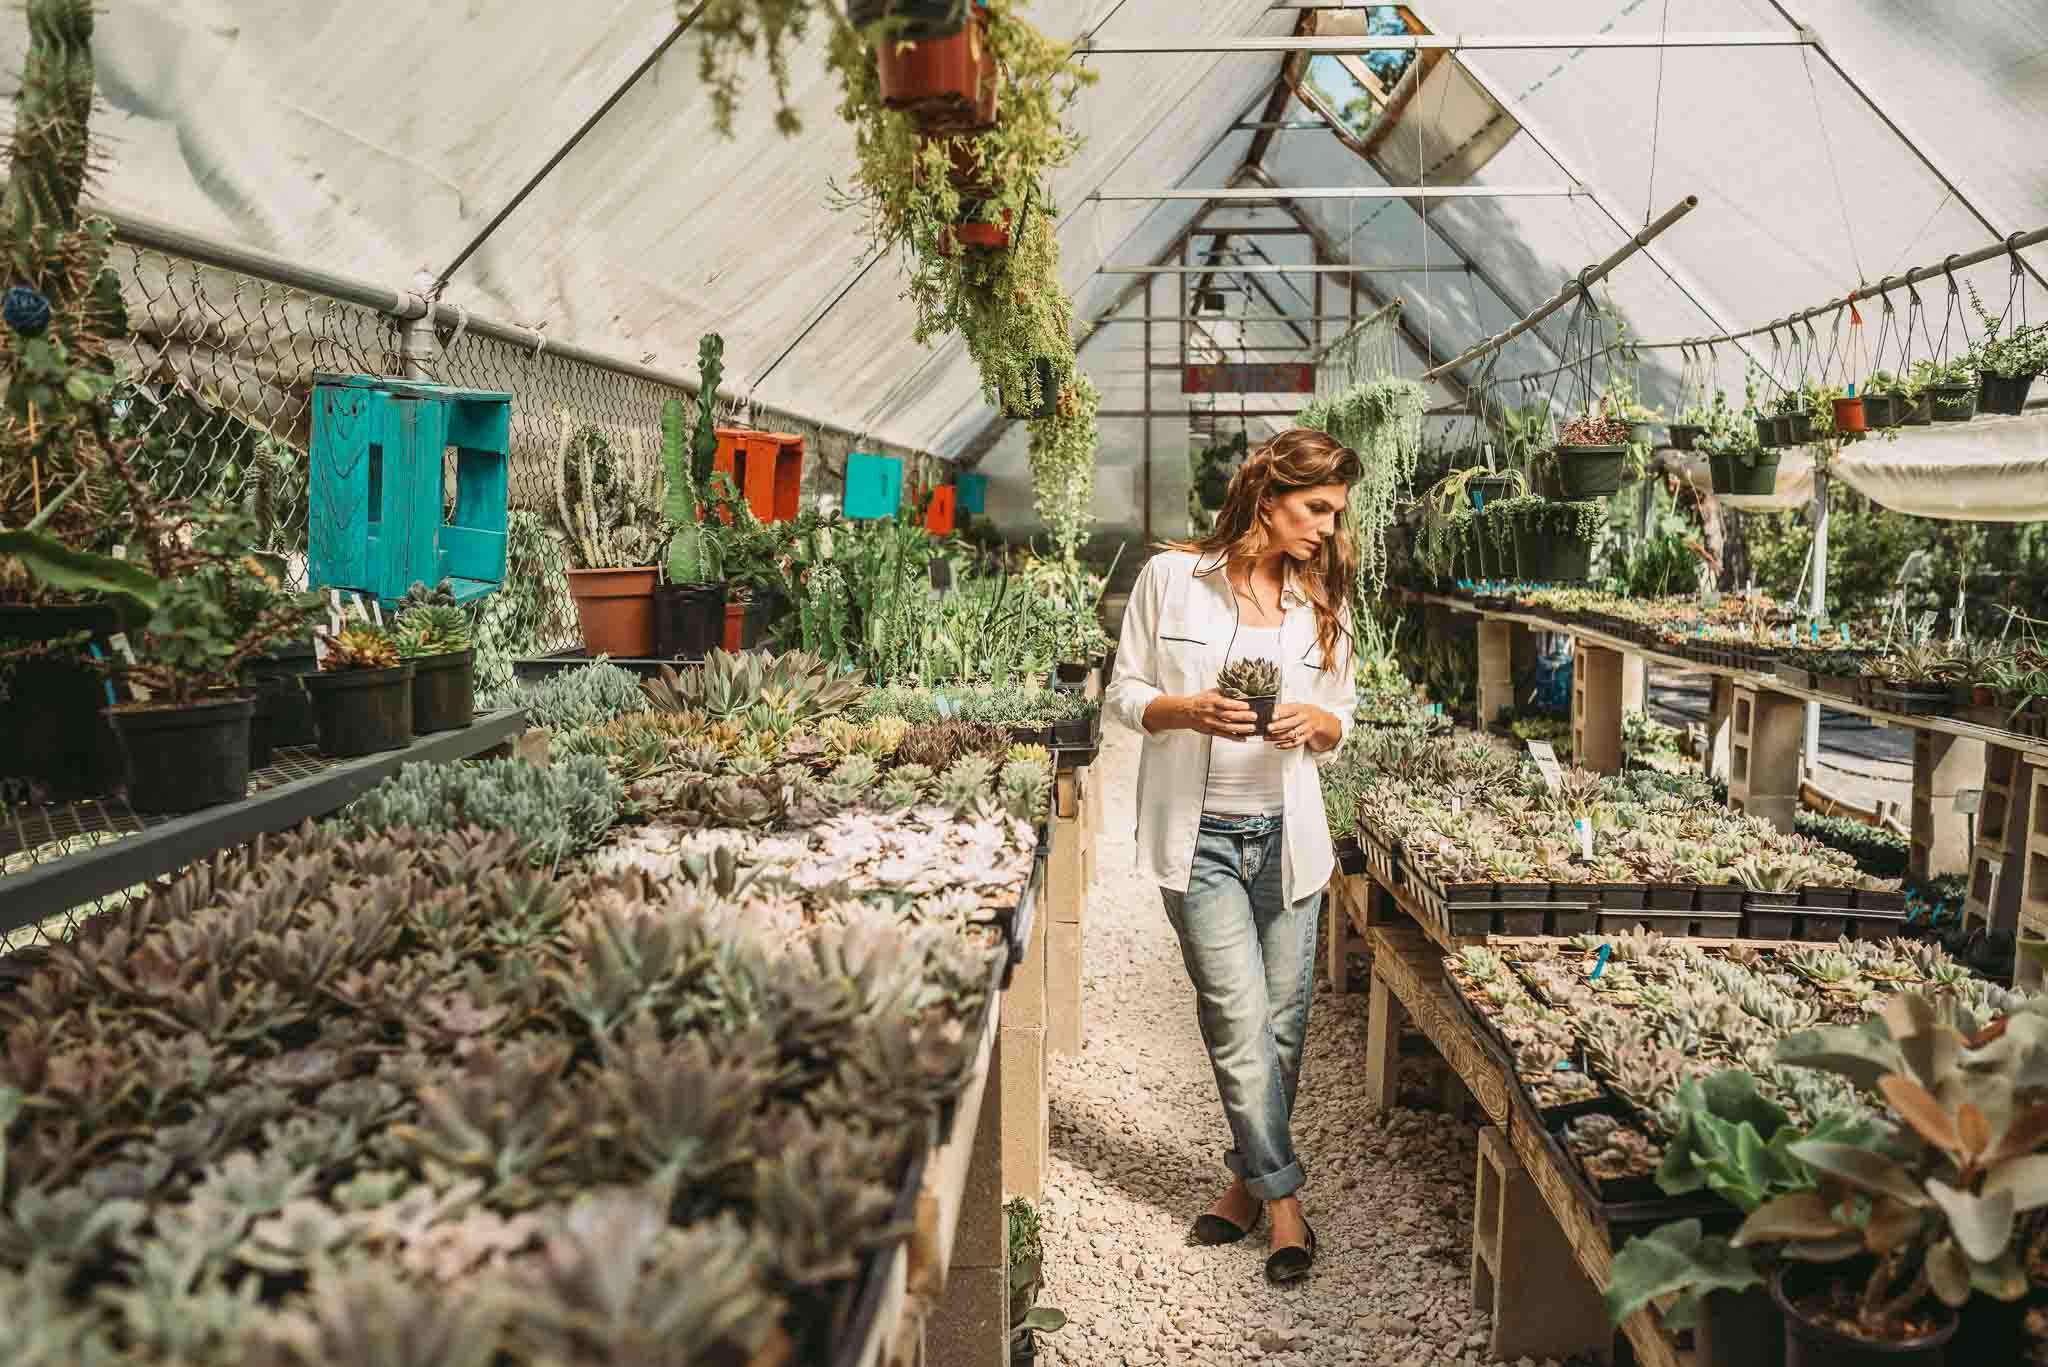 Genevieve Padalecki for Target - social media and blog